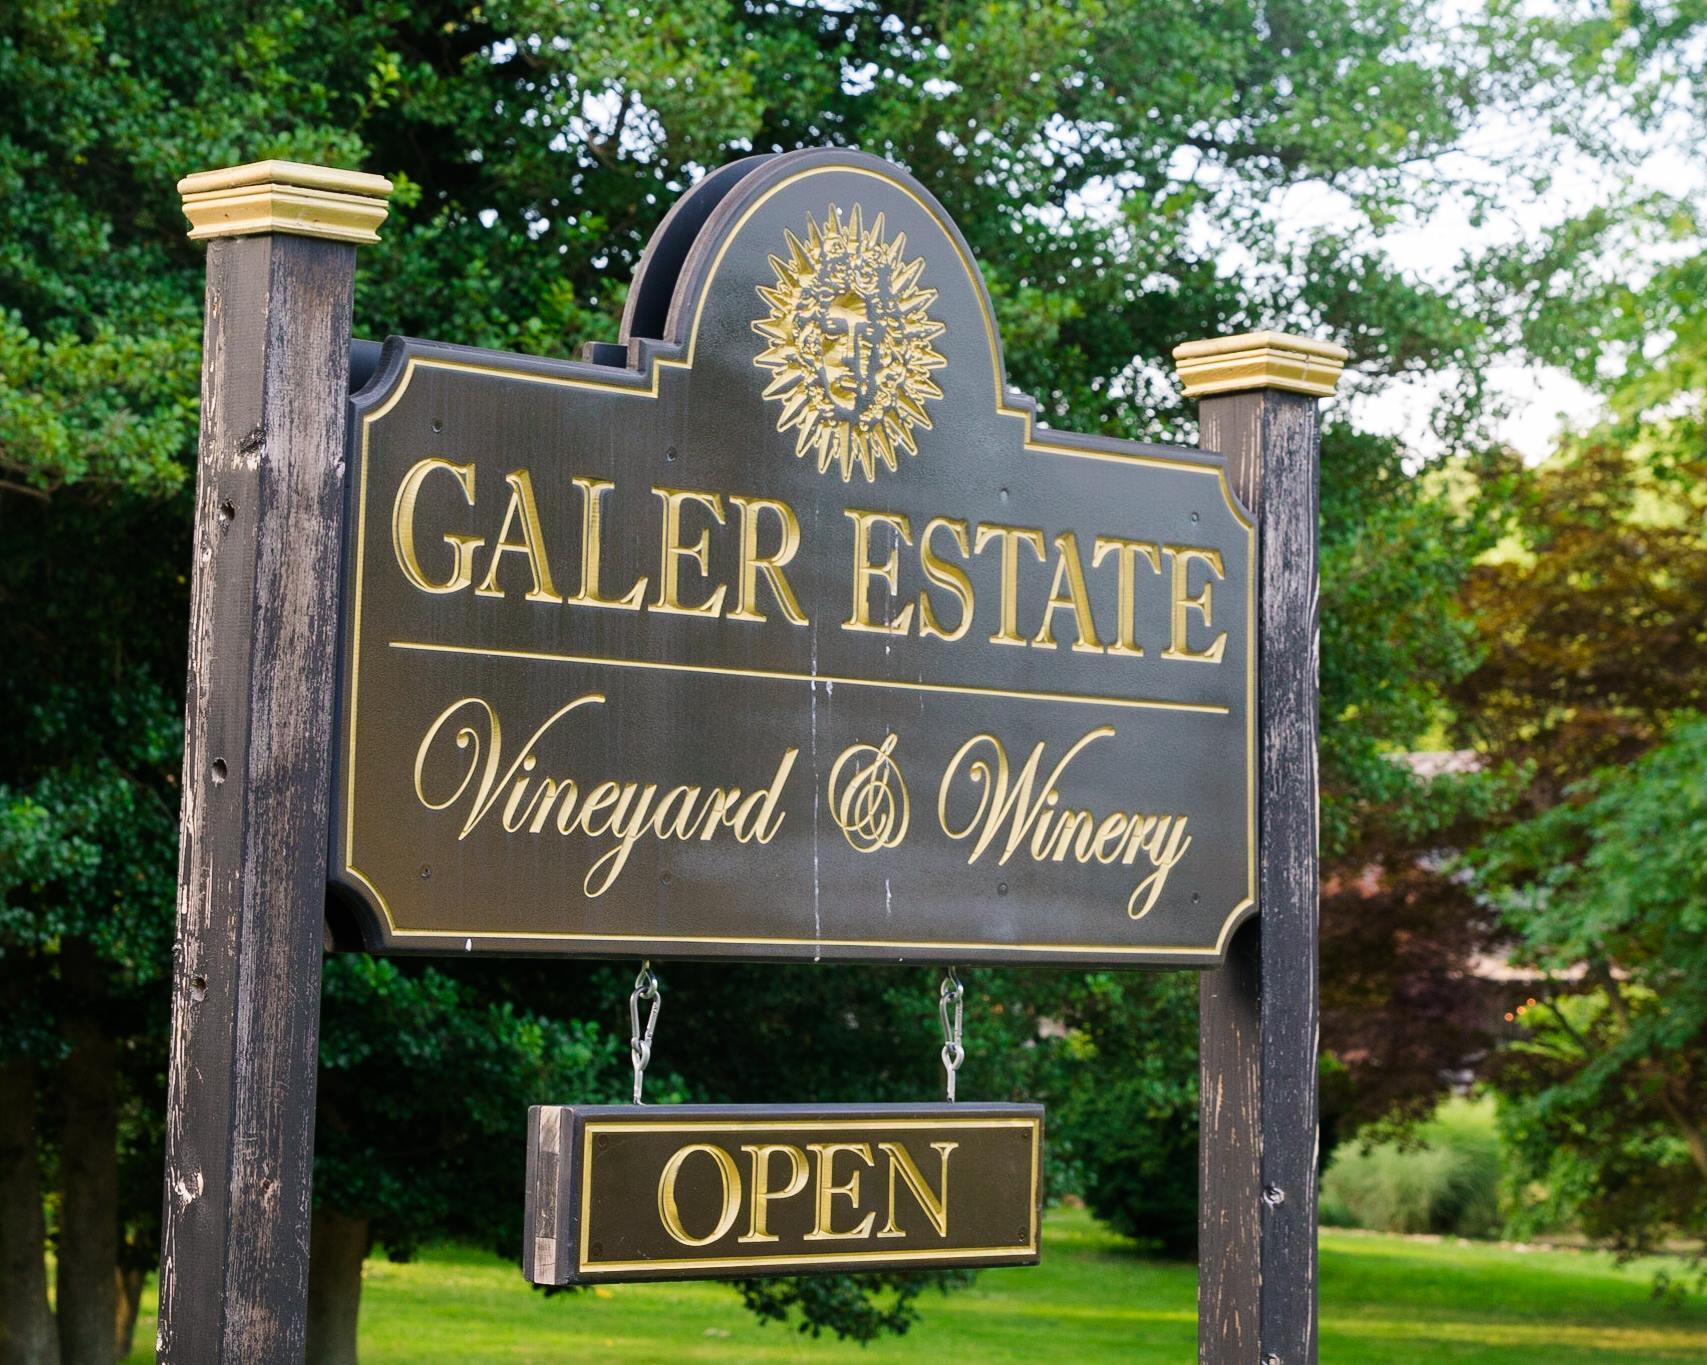 Galer Estate Vineyard and Winery